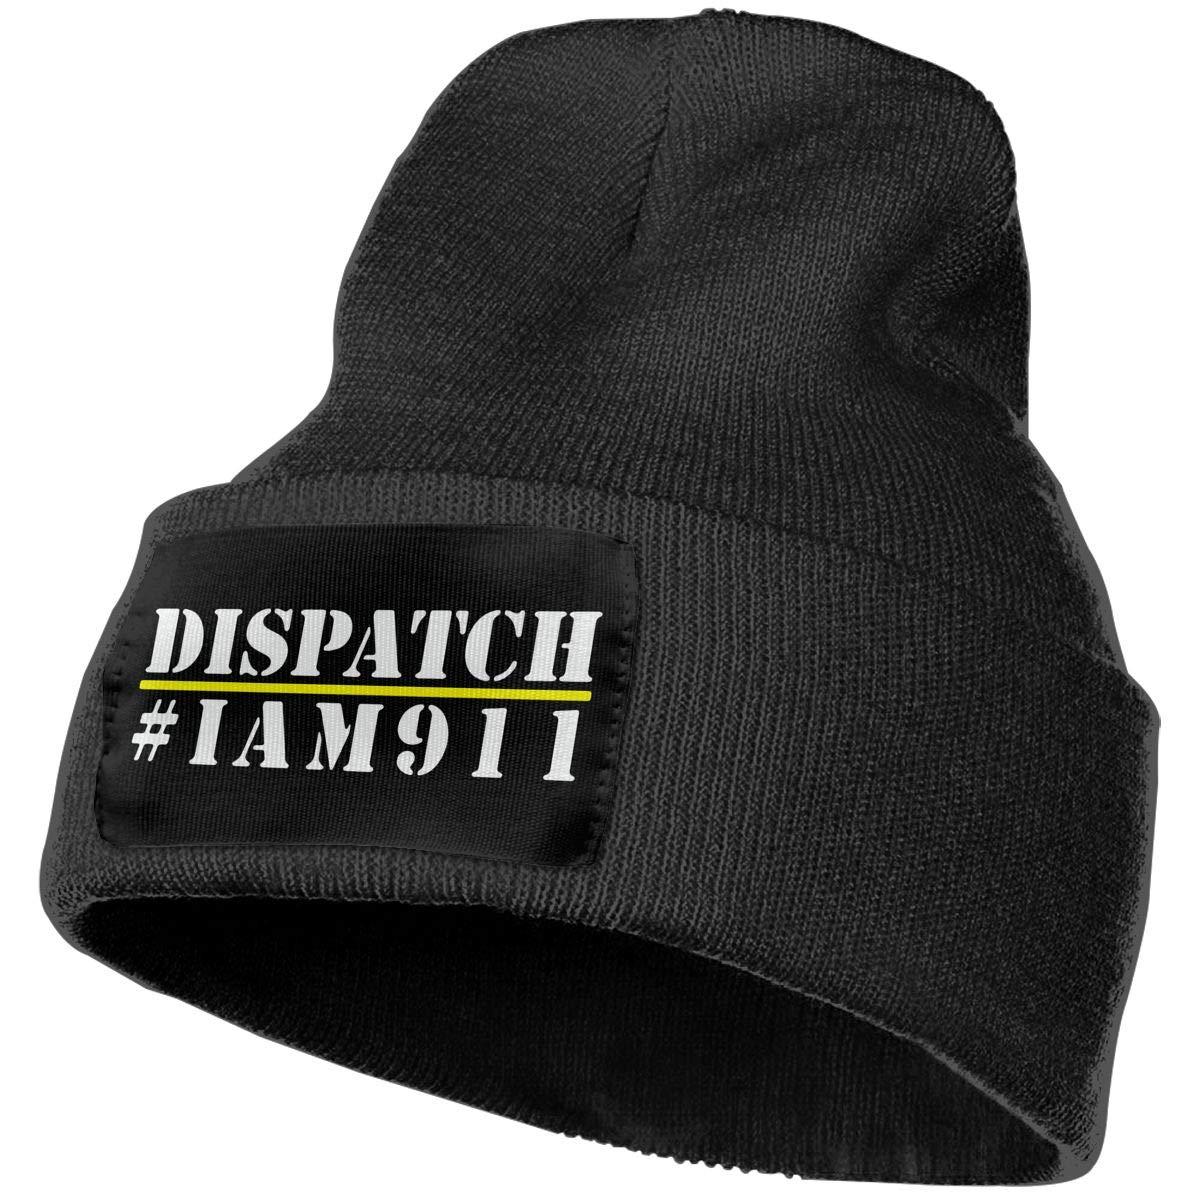 Unisex I Am 911 Dispatcher Outdoor Stretch Knit Beanies Hat Soft Winter Knit Caps